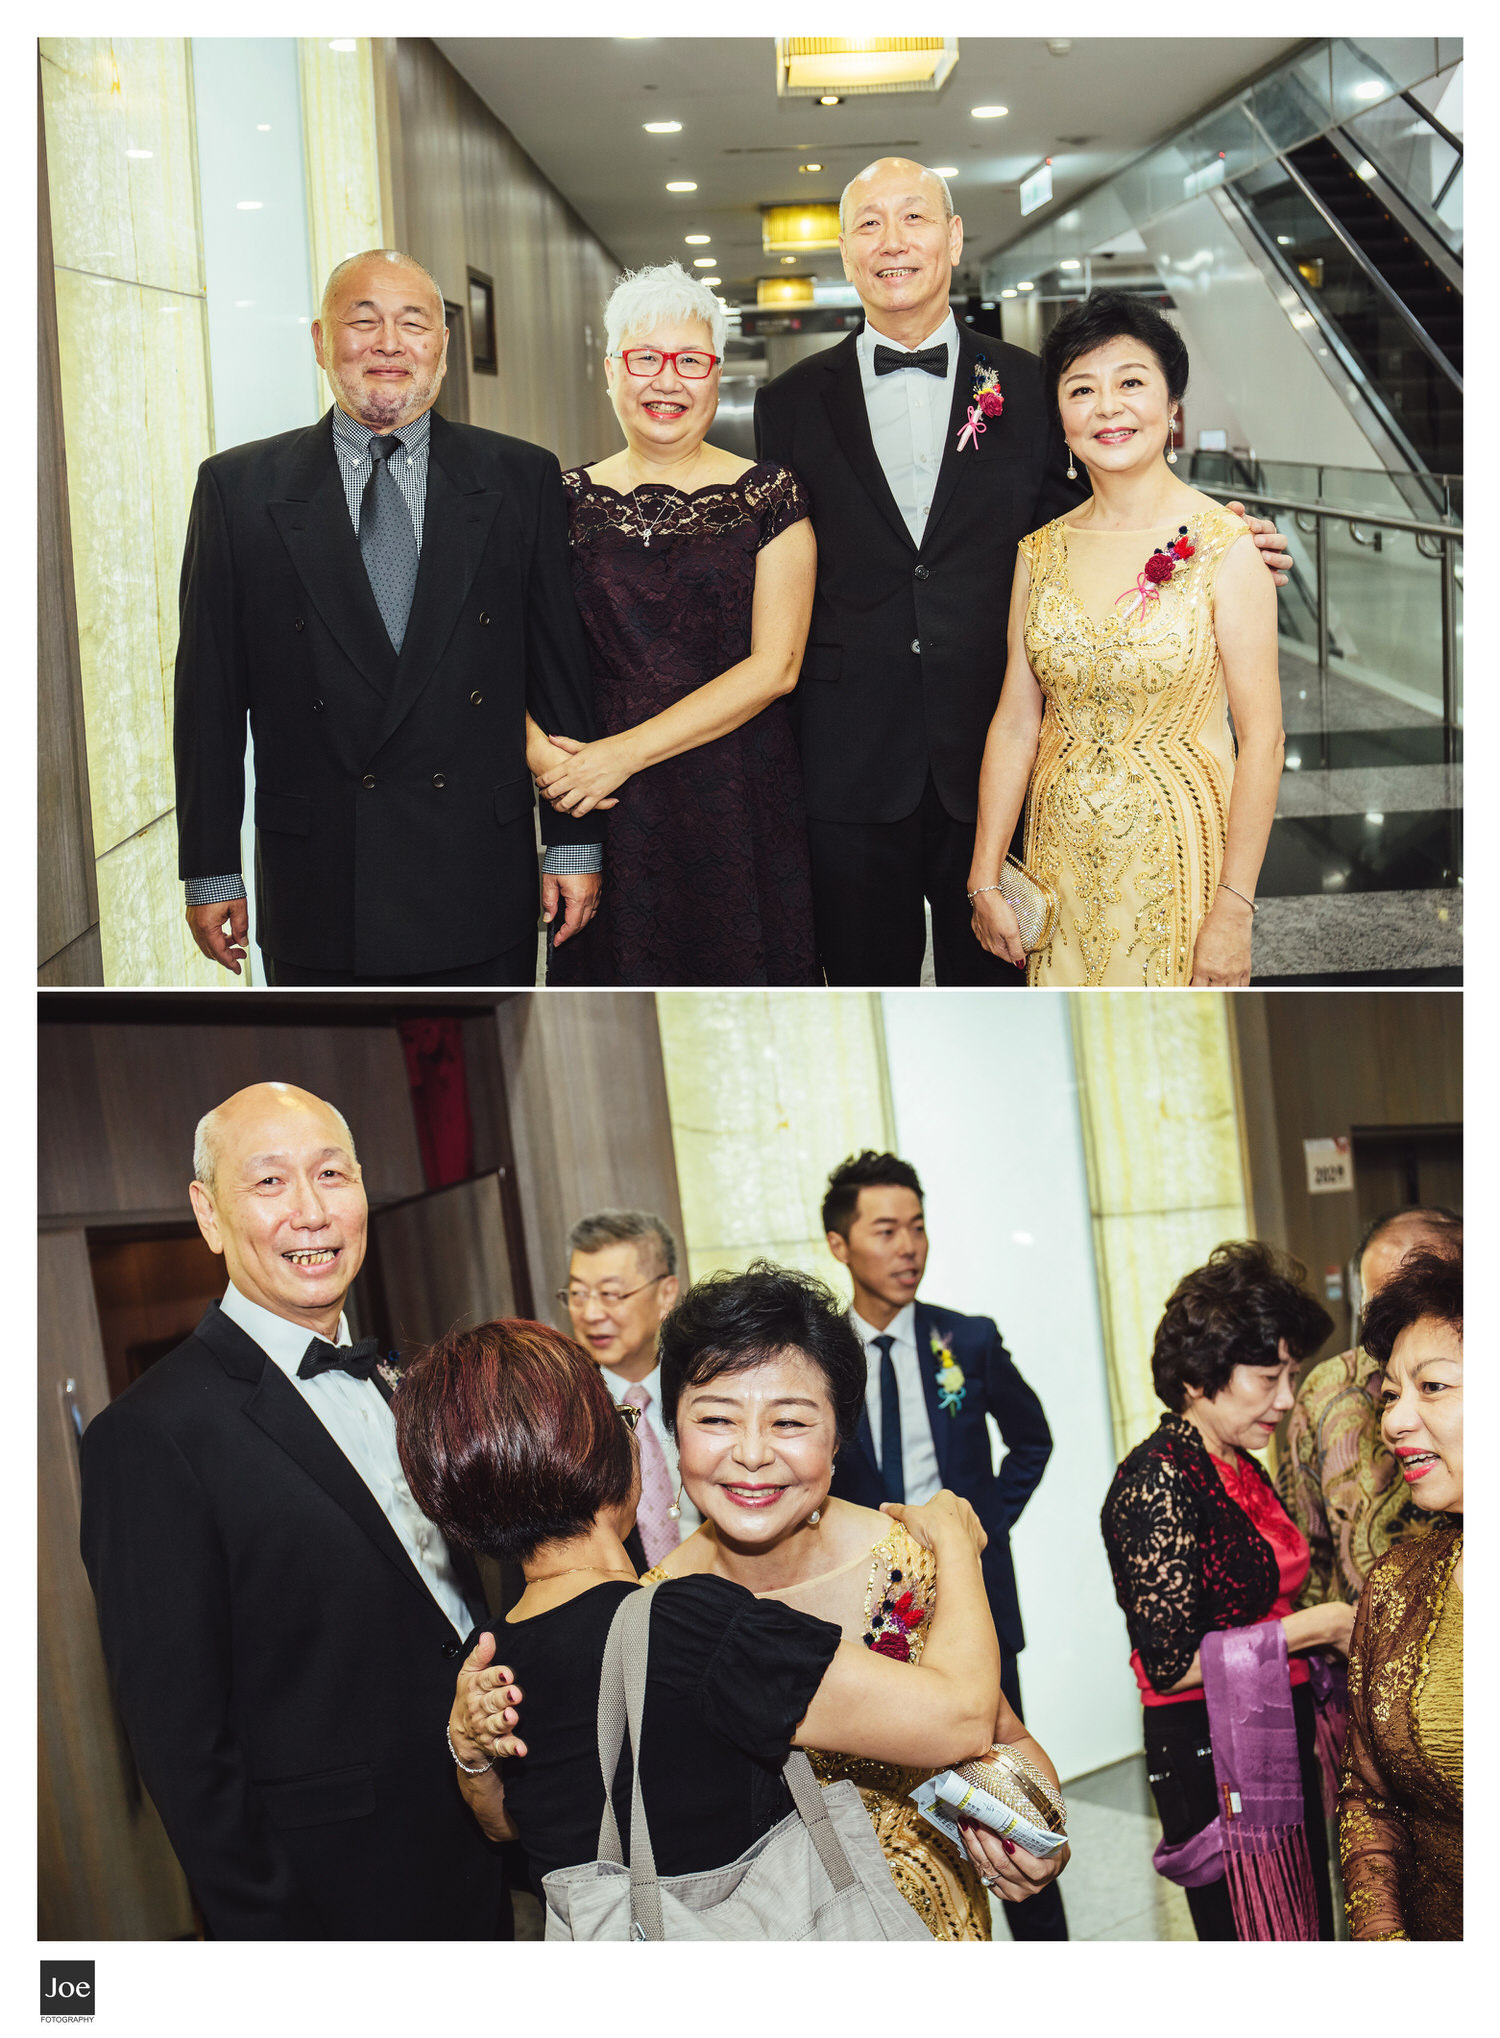 jc-olivia-wedding-82-liyan-banquet-hall-joe-fotography.jpg